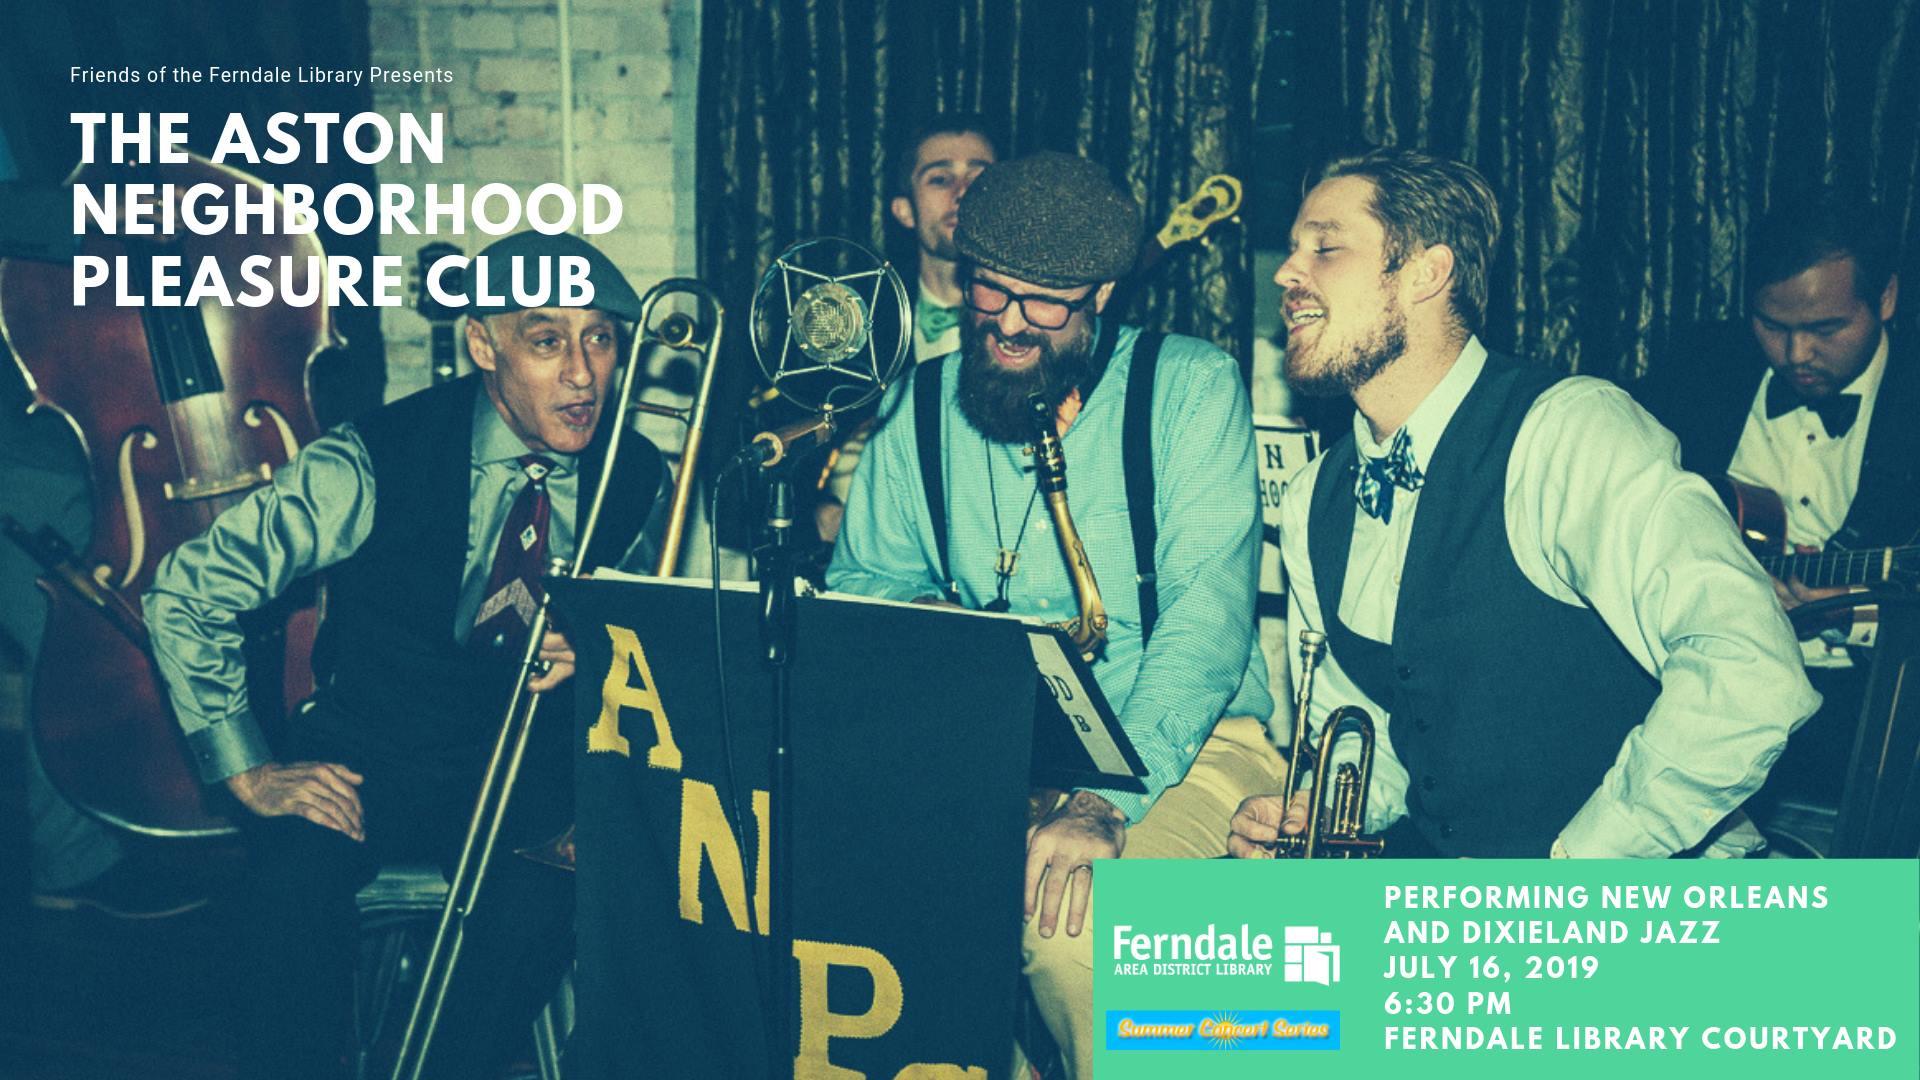 Summer Concert Series: The Aston Neighborhood Pleasure Club